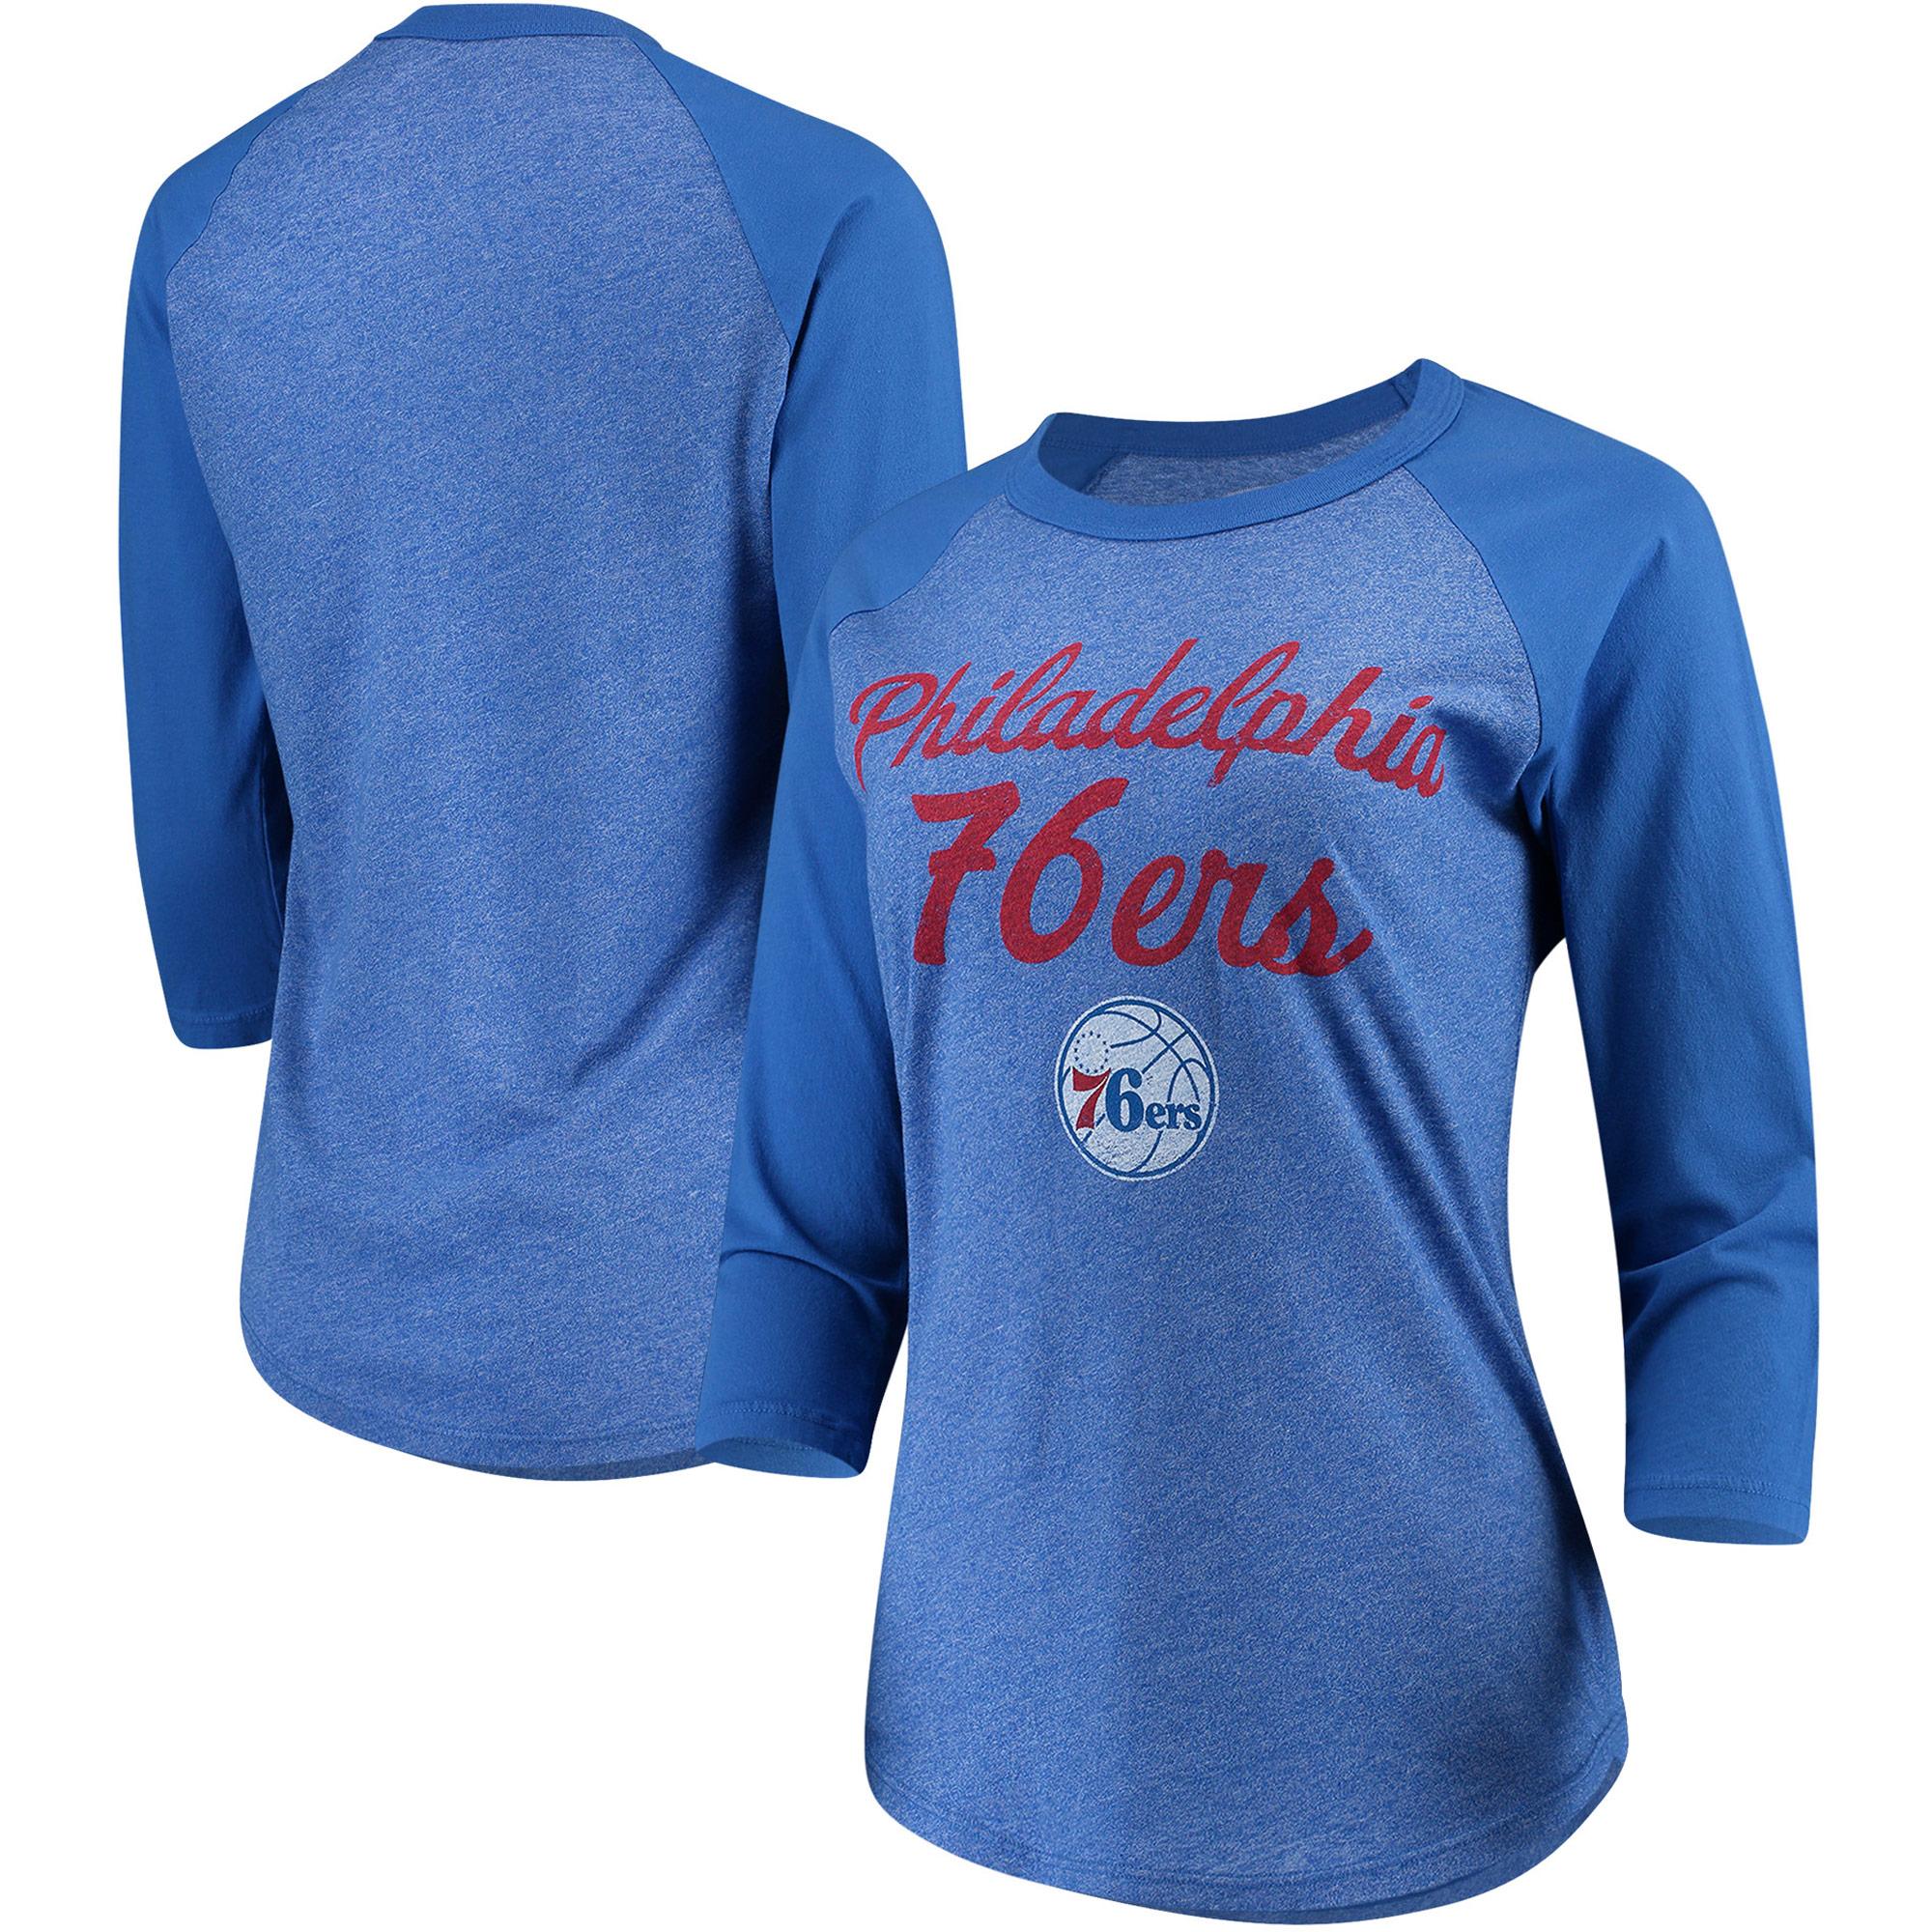 Philadelphia 76ers Majestic Threads Women's Double Dribble Raglan Tri-Blend 3/4-Sleeve T-Shirt - Heathered Royal/Royal